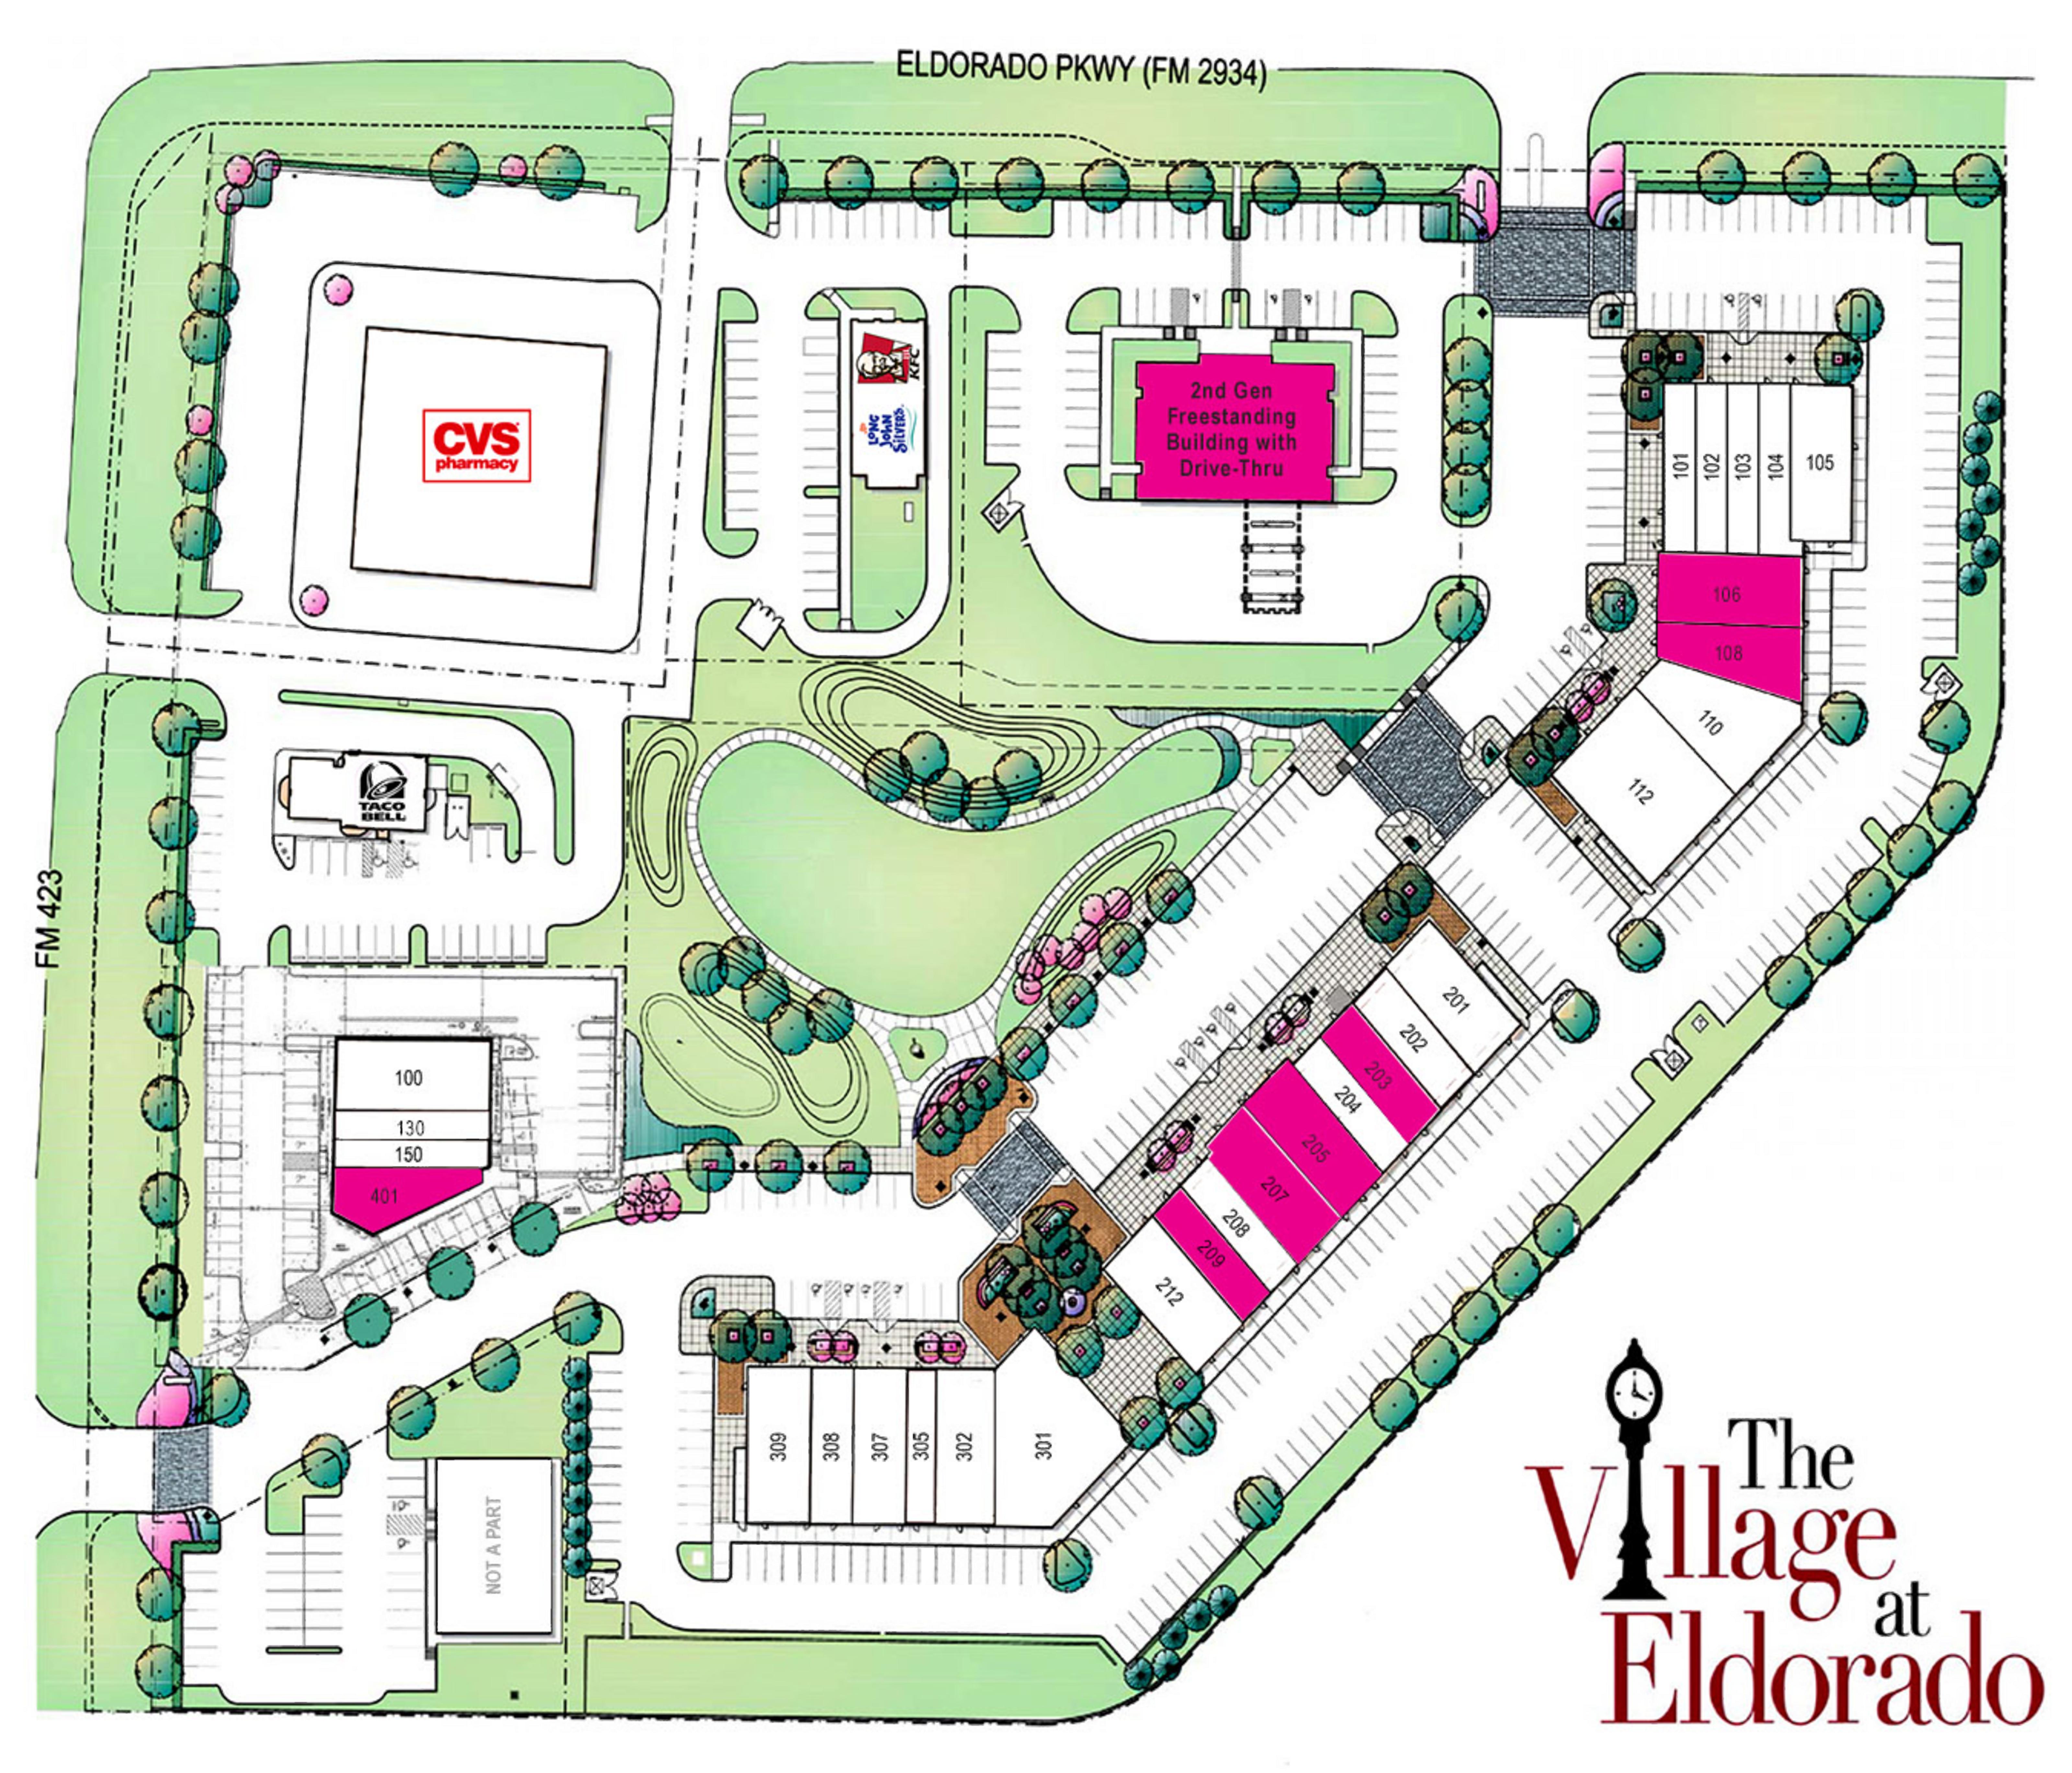 The Village at Eldorado: site plan